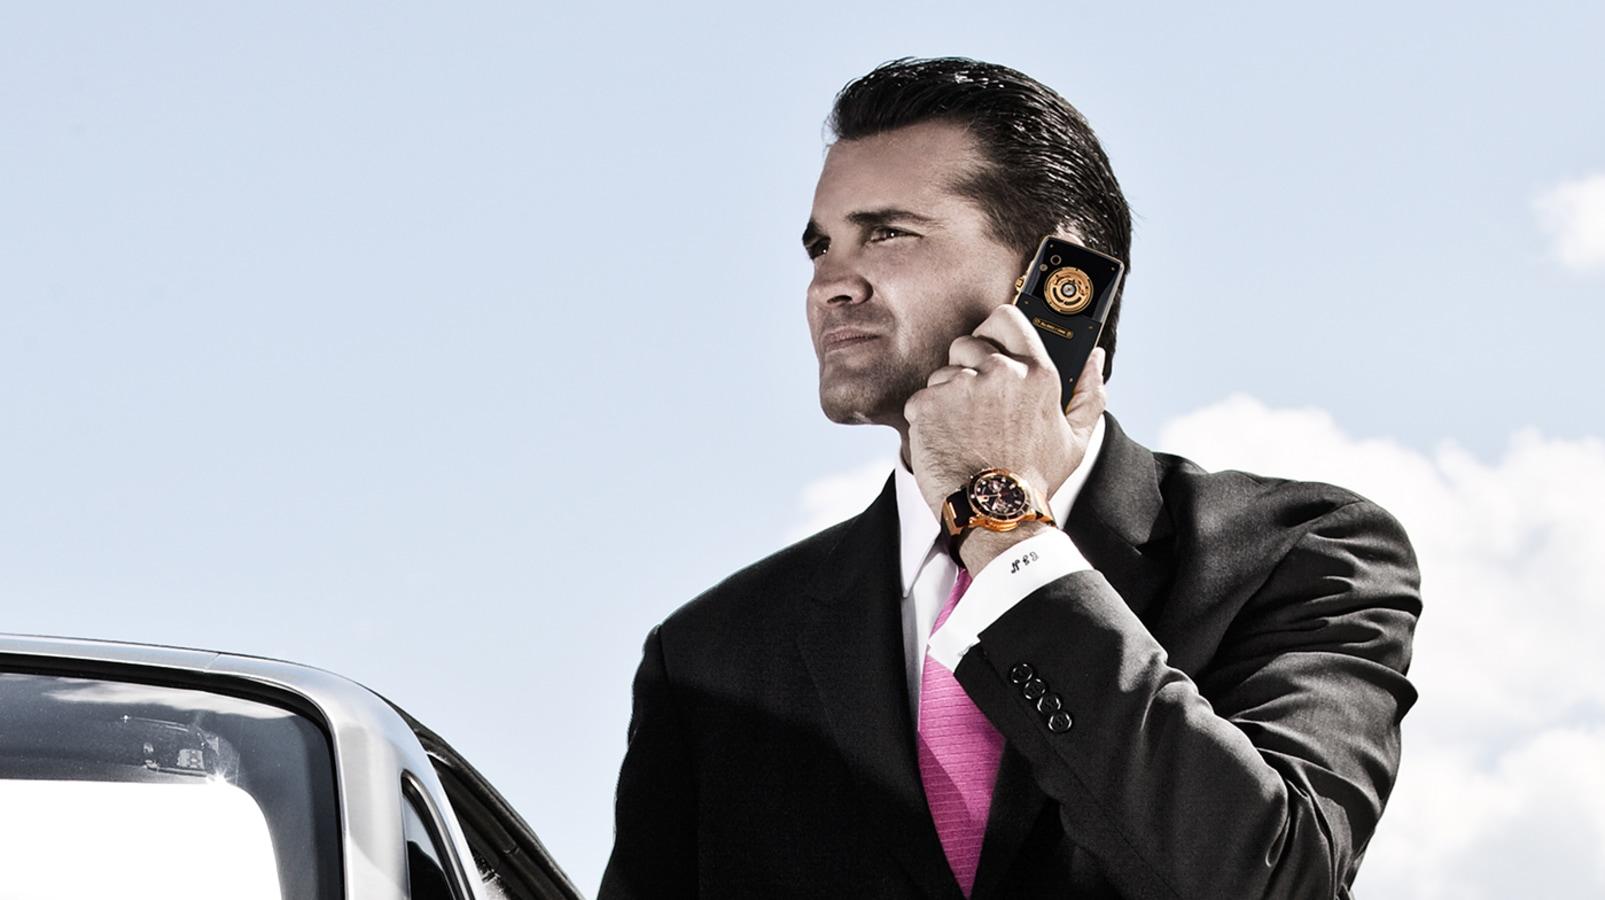 Man holding a Ulysse Nardin cell phone